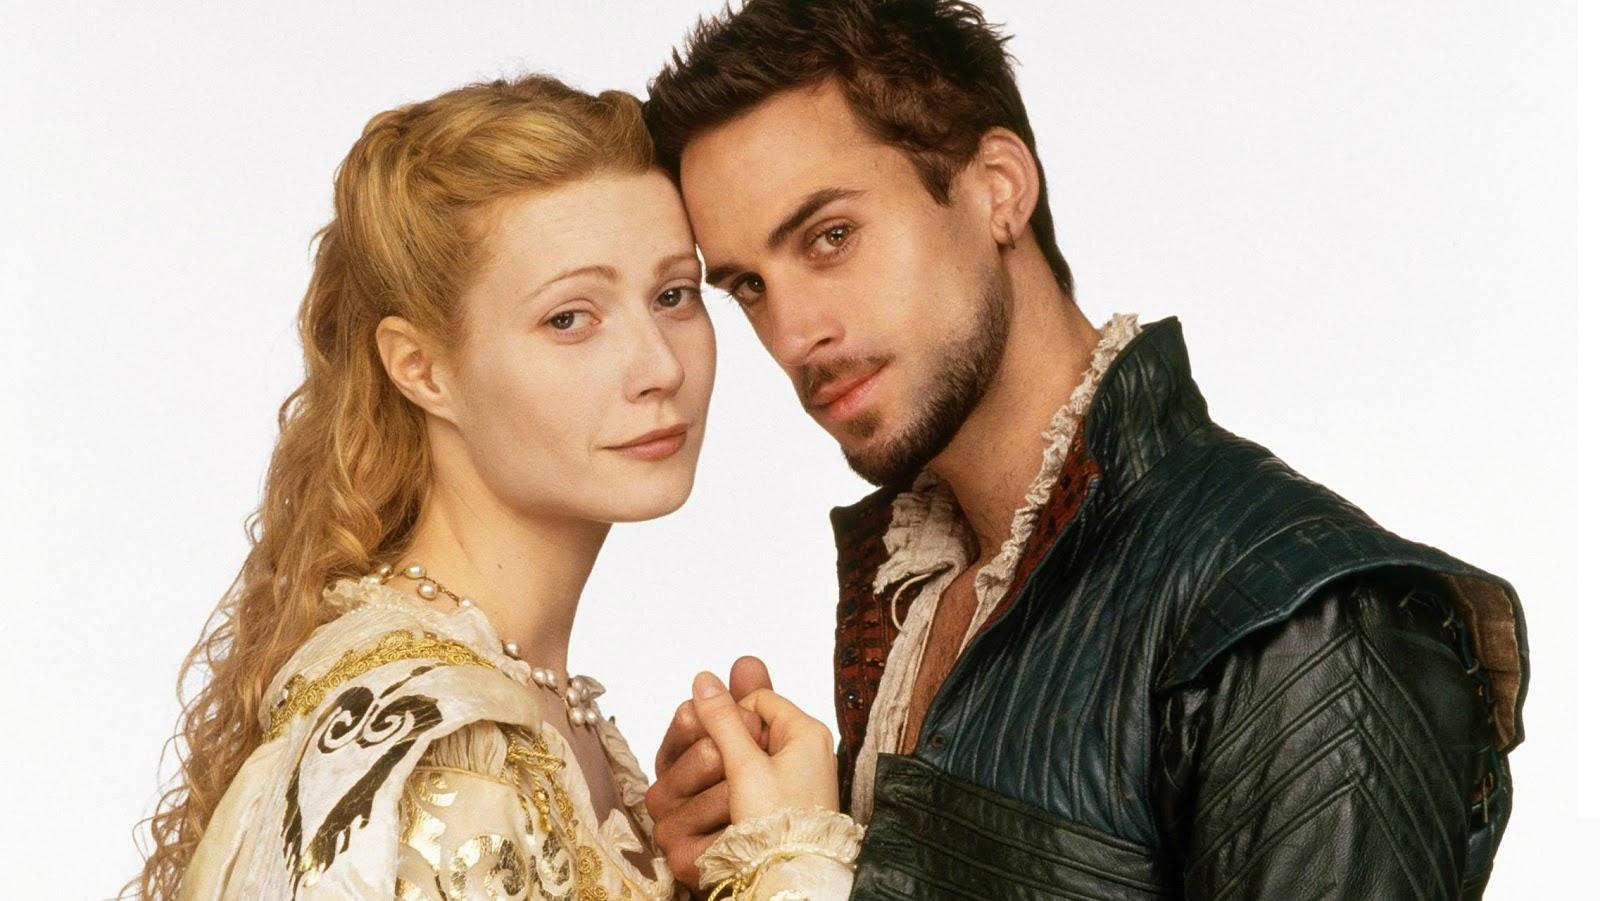 Citaten Shakespeare Love : Shakespeare apasionado review propio taringa